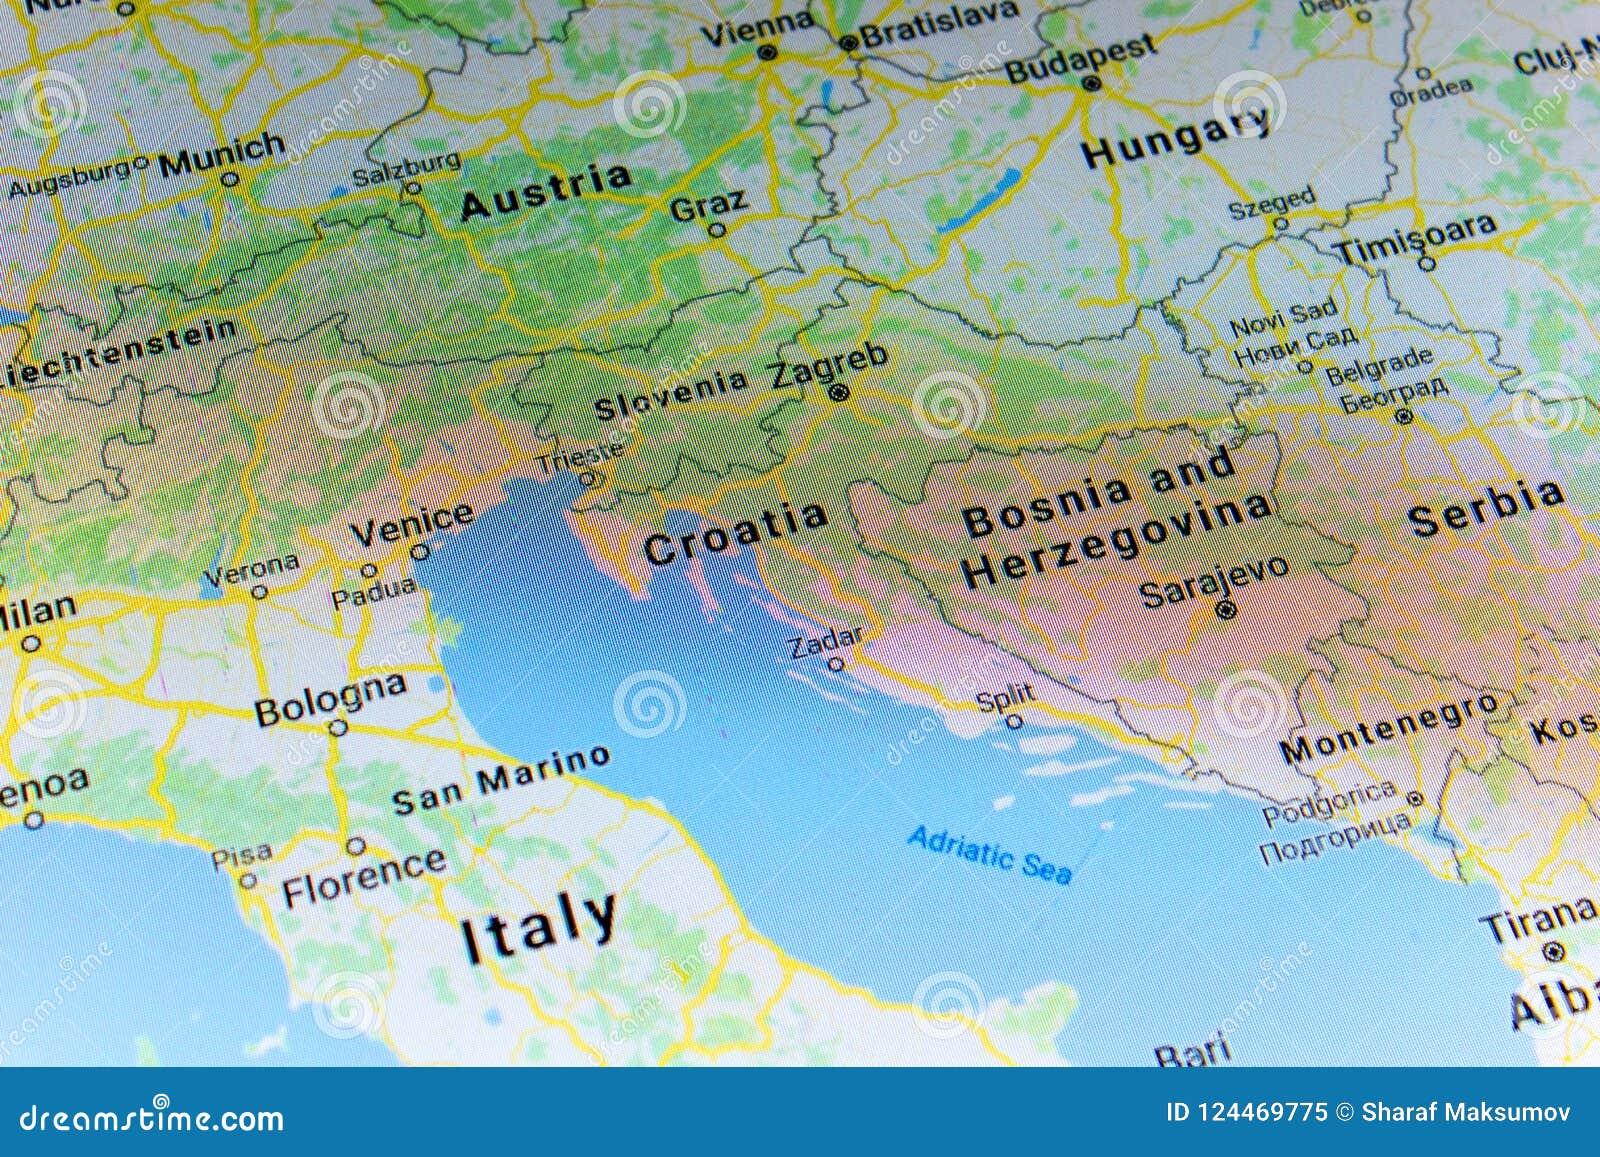 Ryazan, Russia   July 08, 2018: Country Of Croatia On The Google